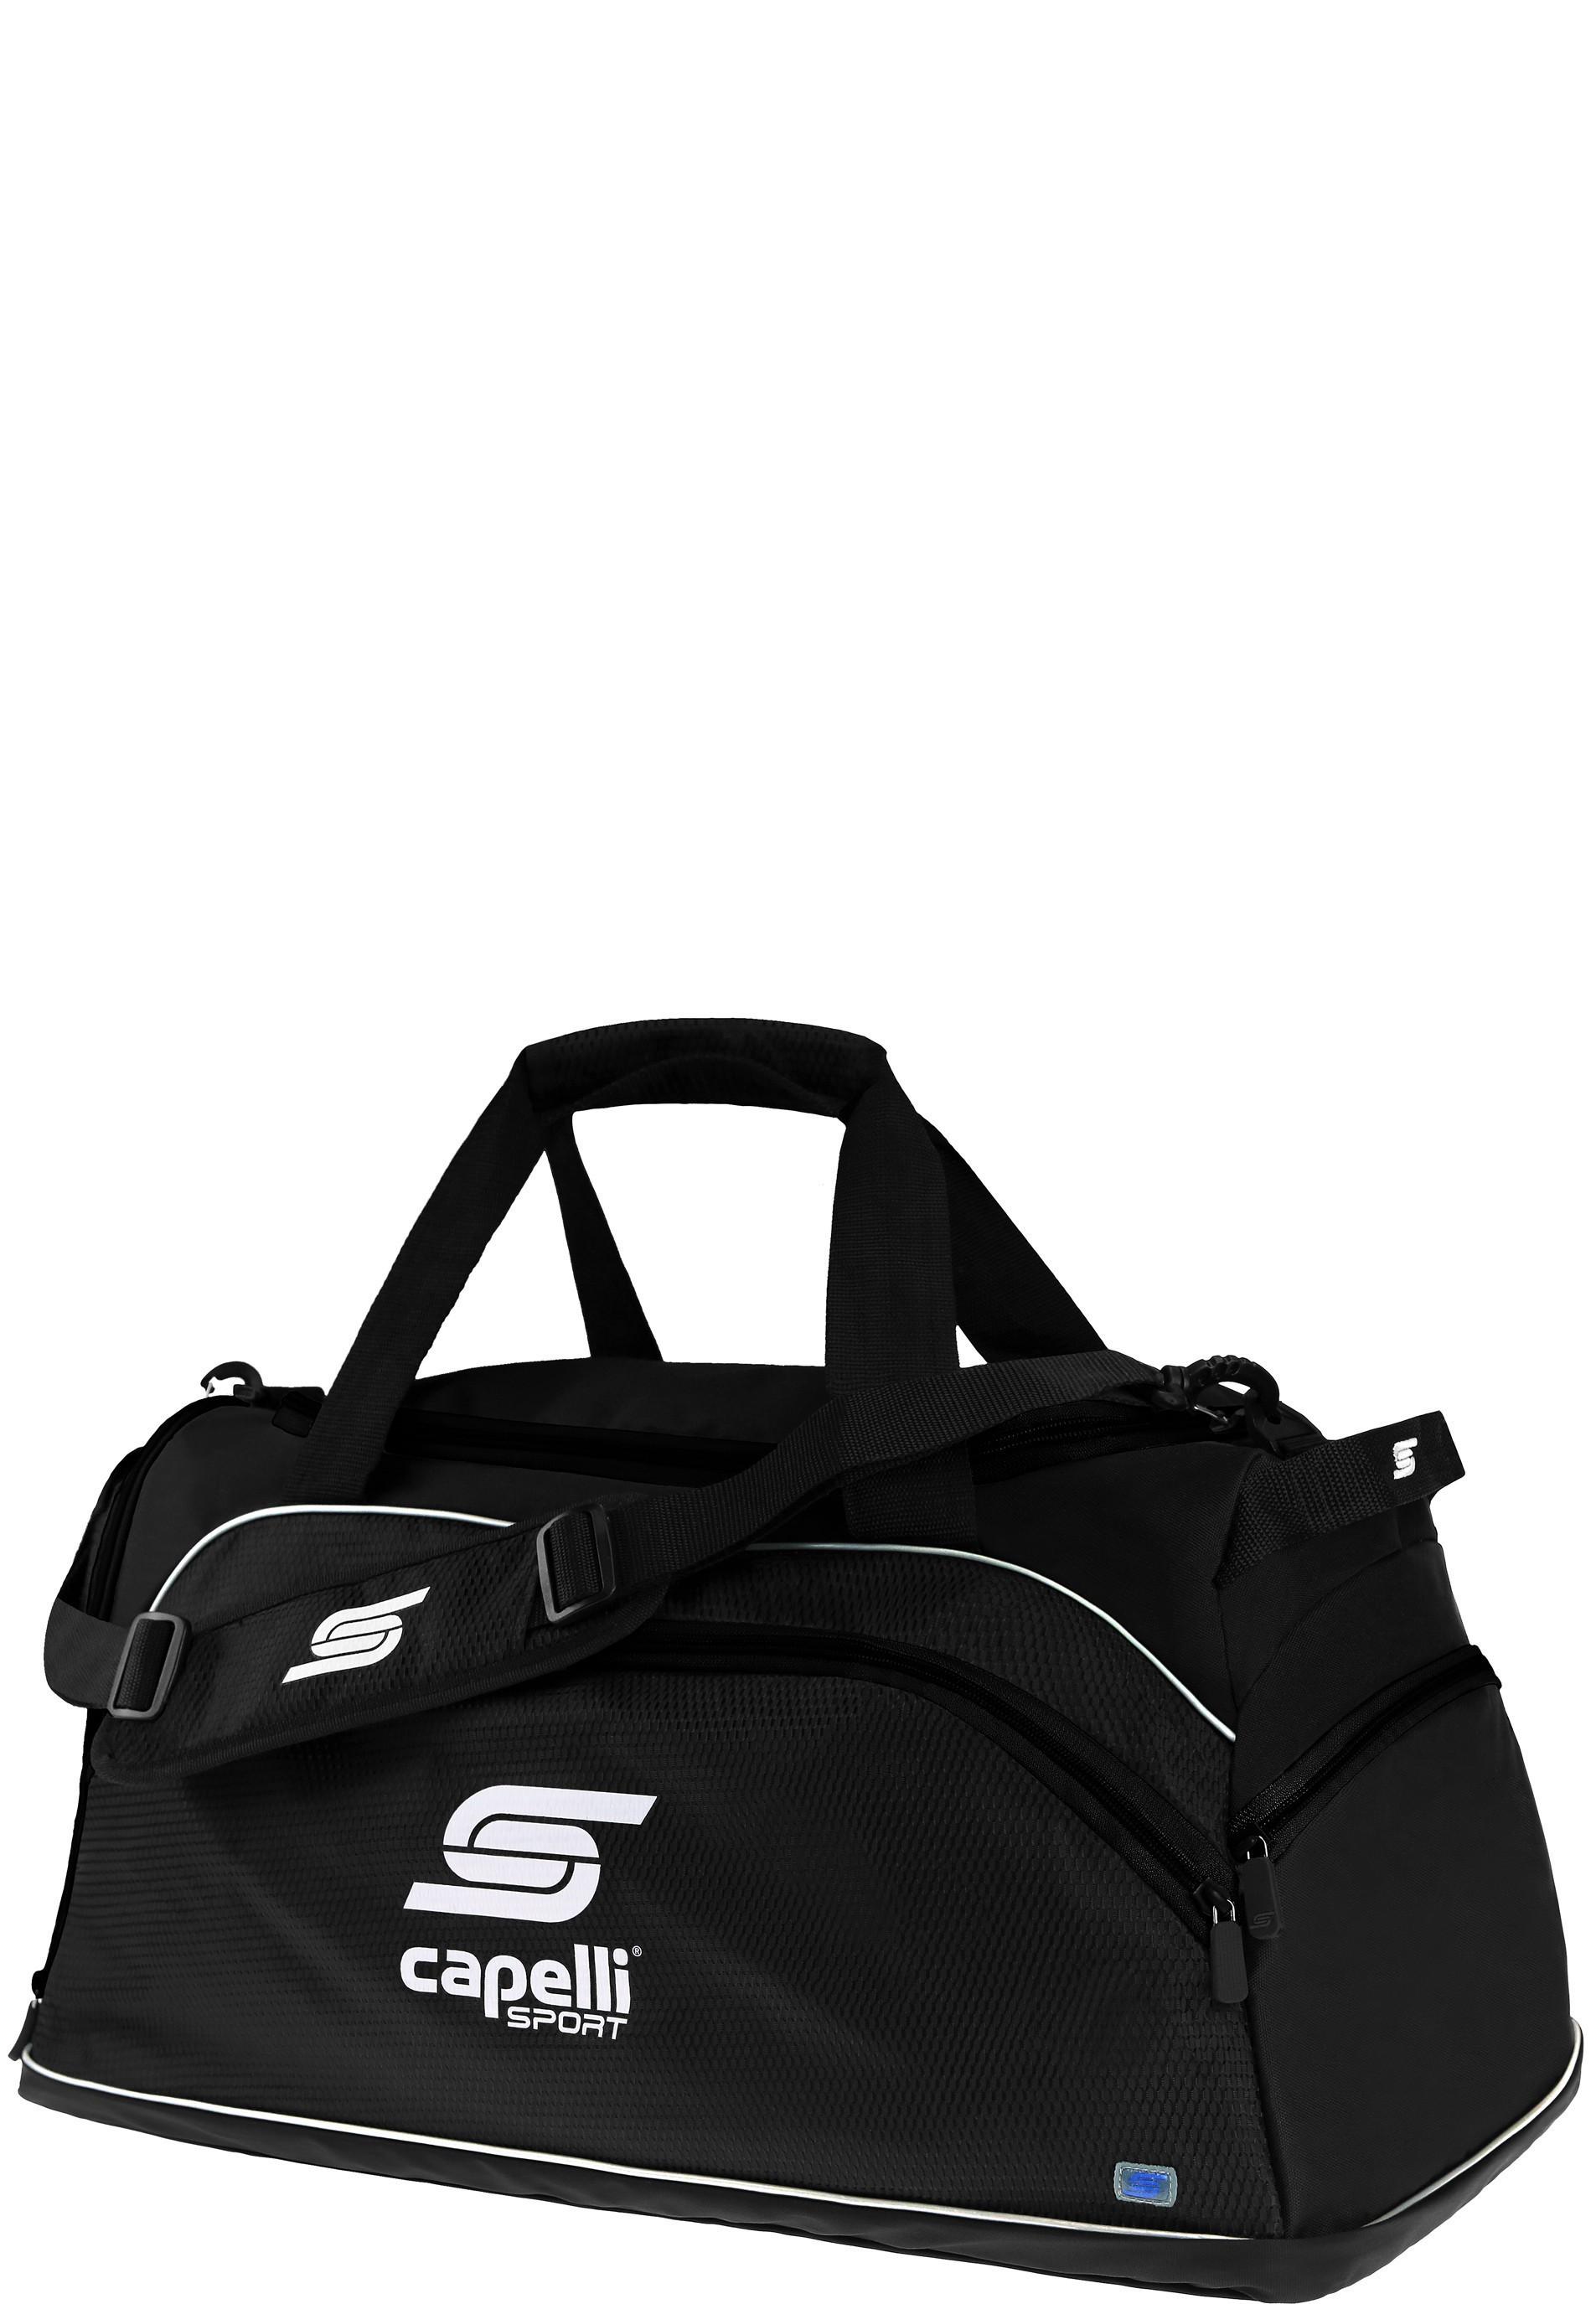 CS ONE Team Duffle Bag- Small